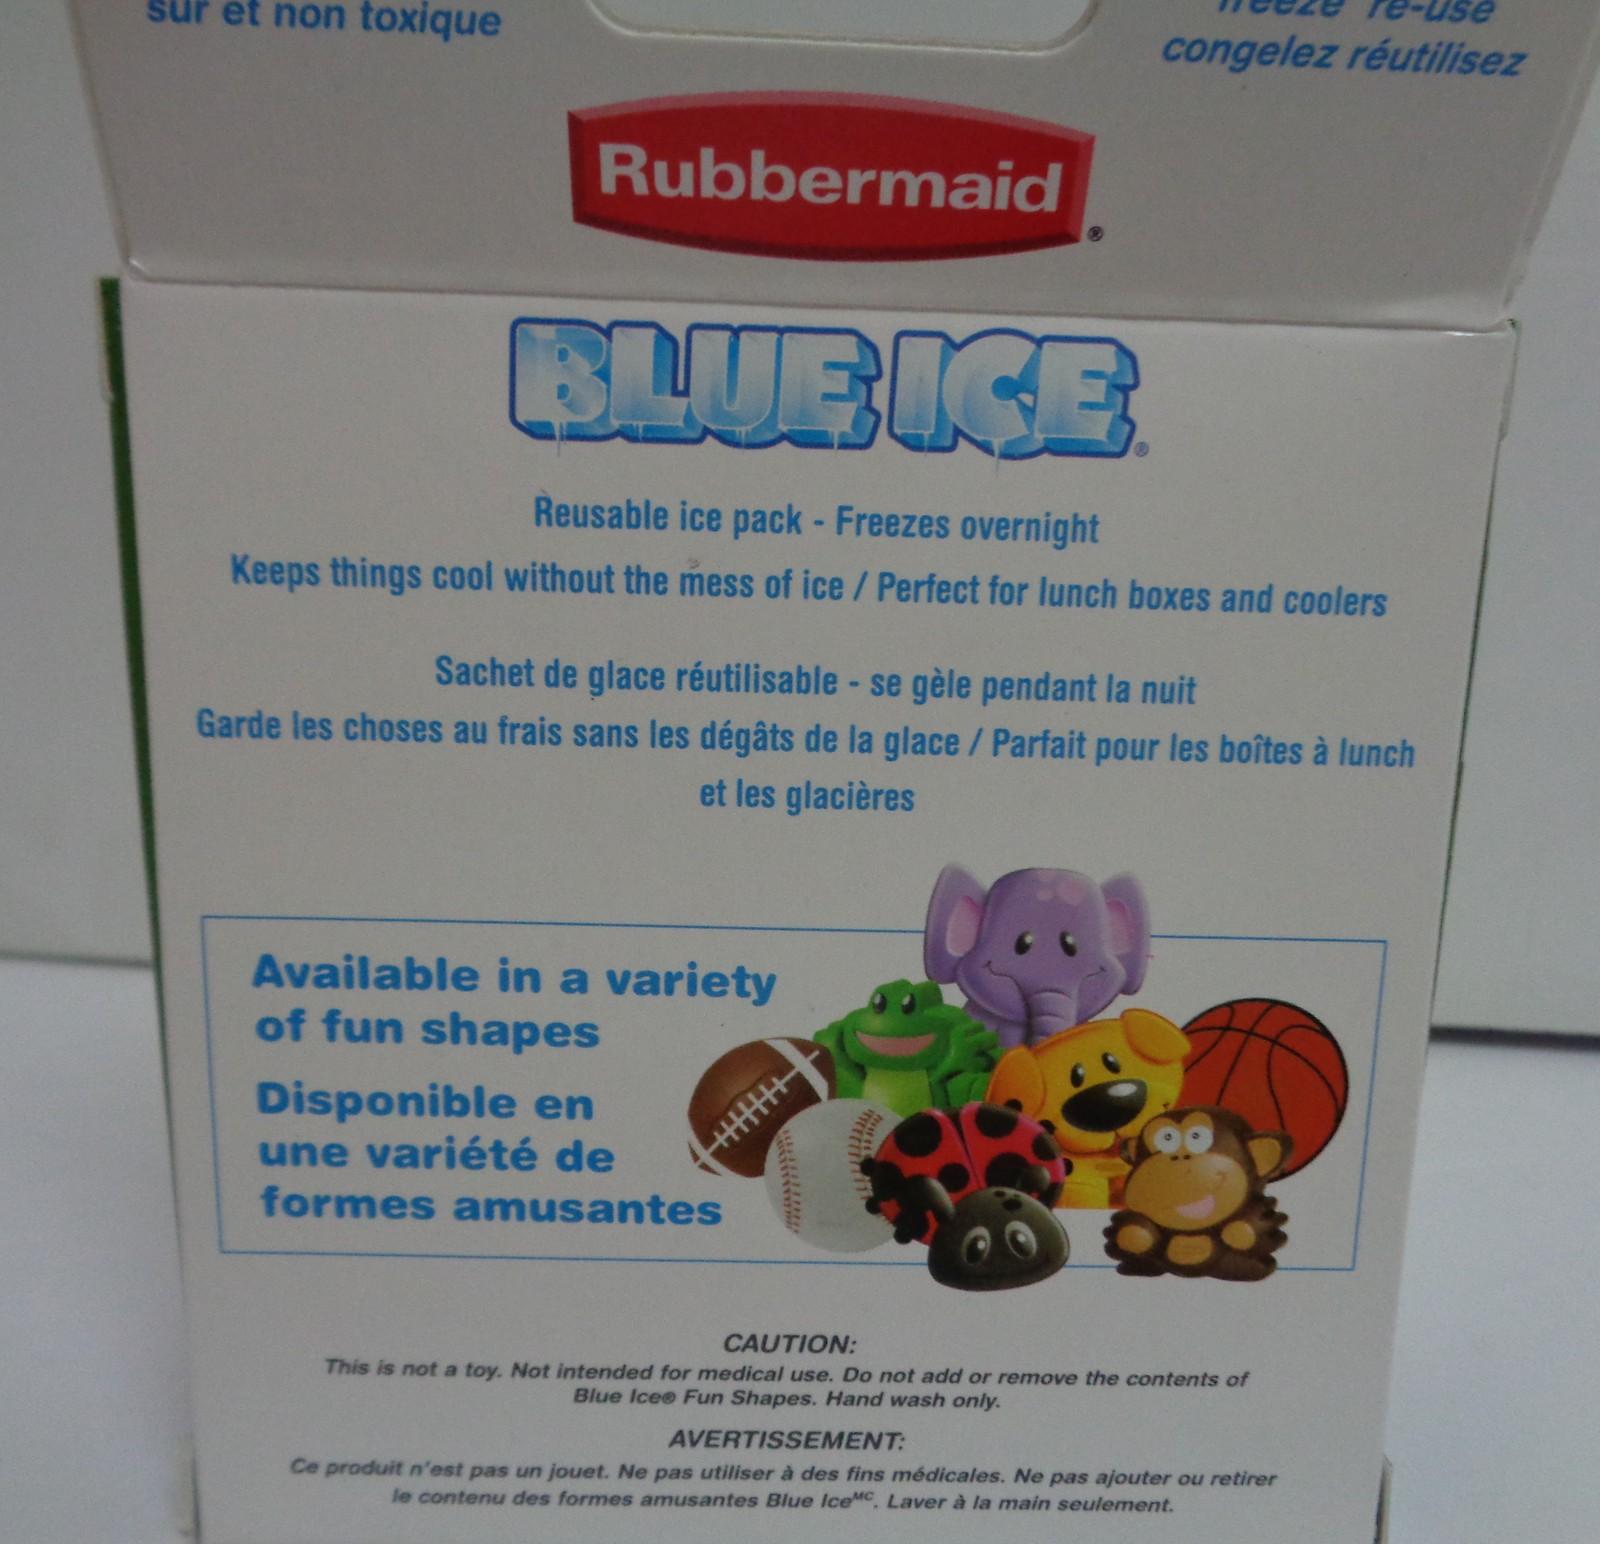 RUBBERMAID BLUE ICE PACK FUN SHAPE GREEN FROG NIB